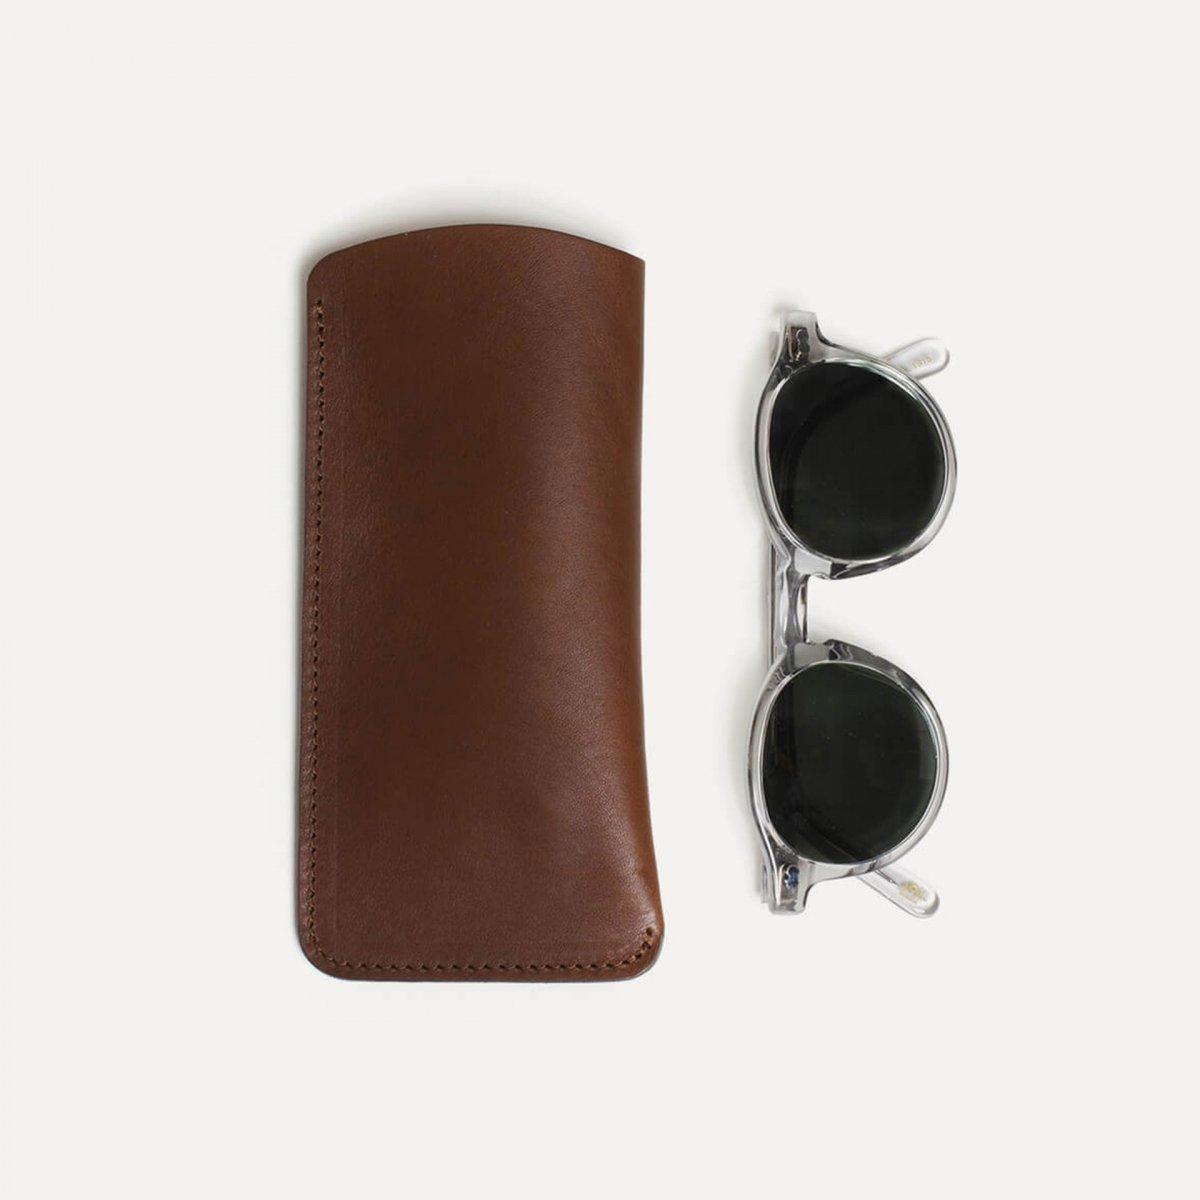 Binocle glasses case - Cuba Libre (image n°1)